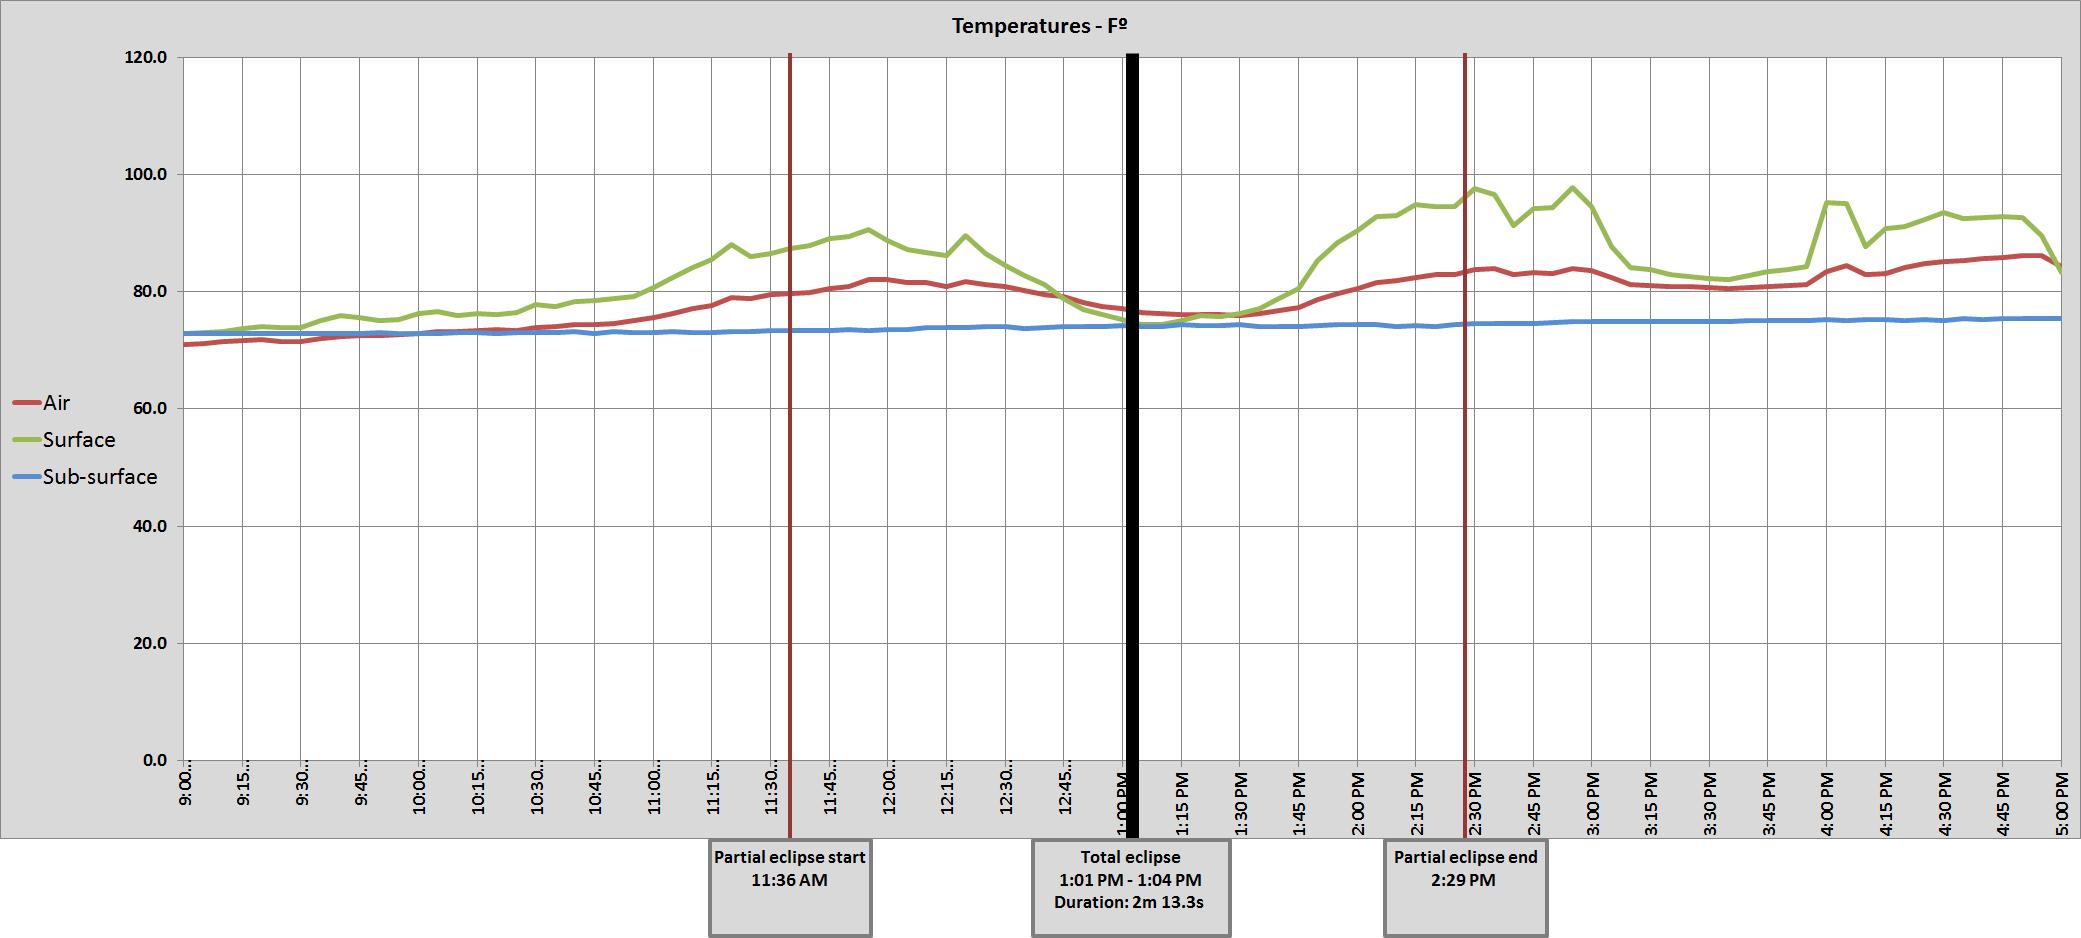 Graph of NE Lincoln 11 SW air temperatures